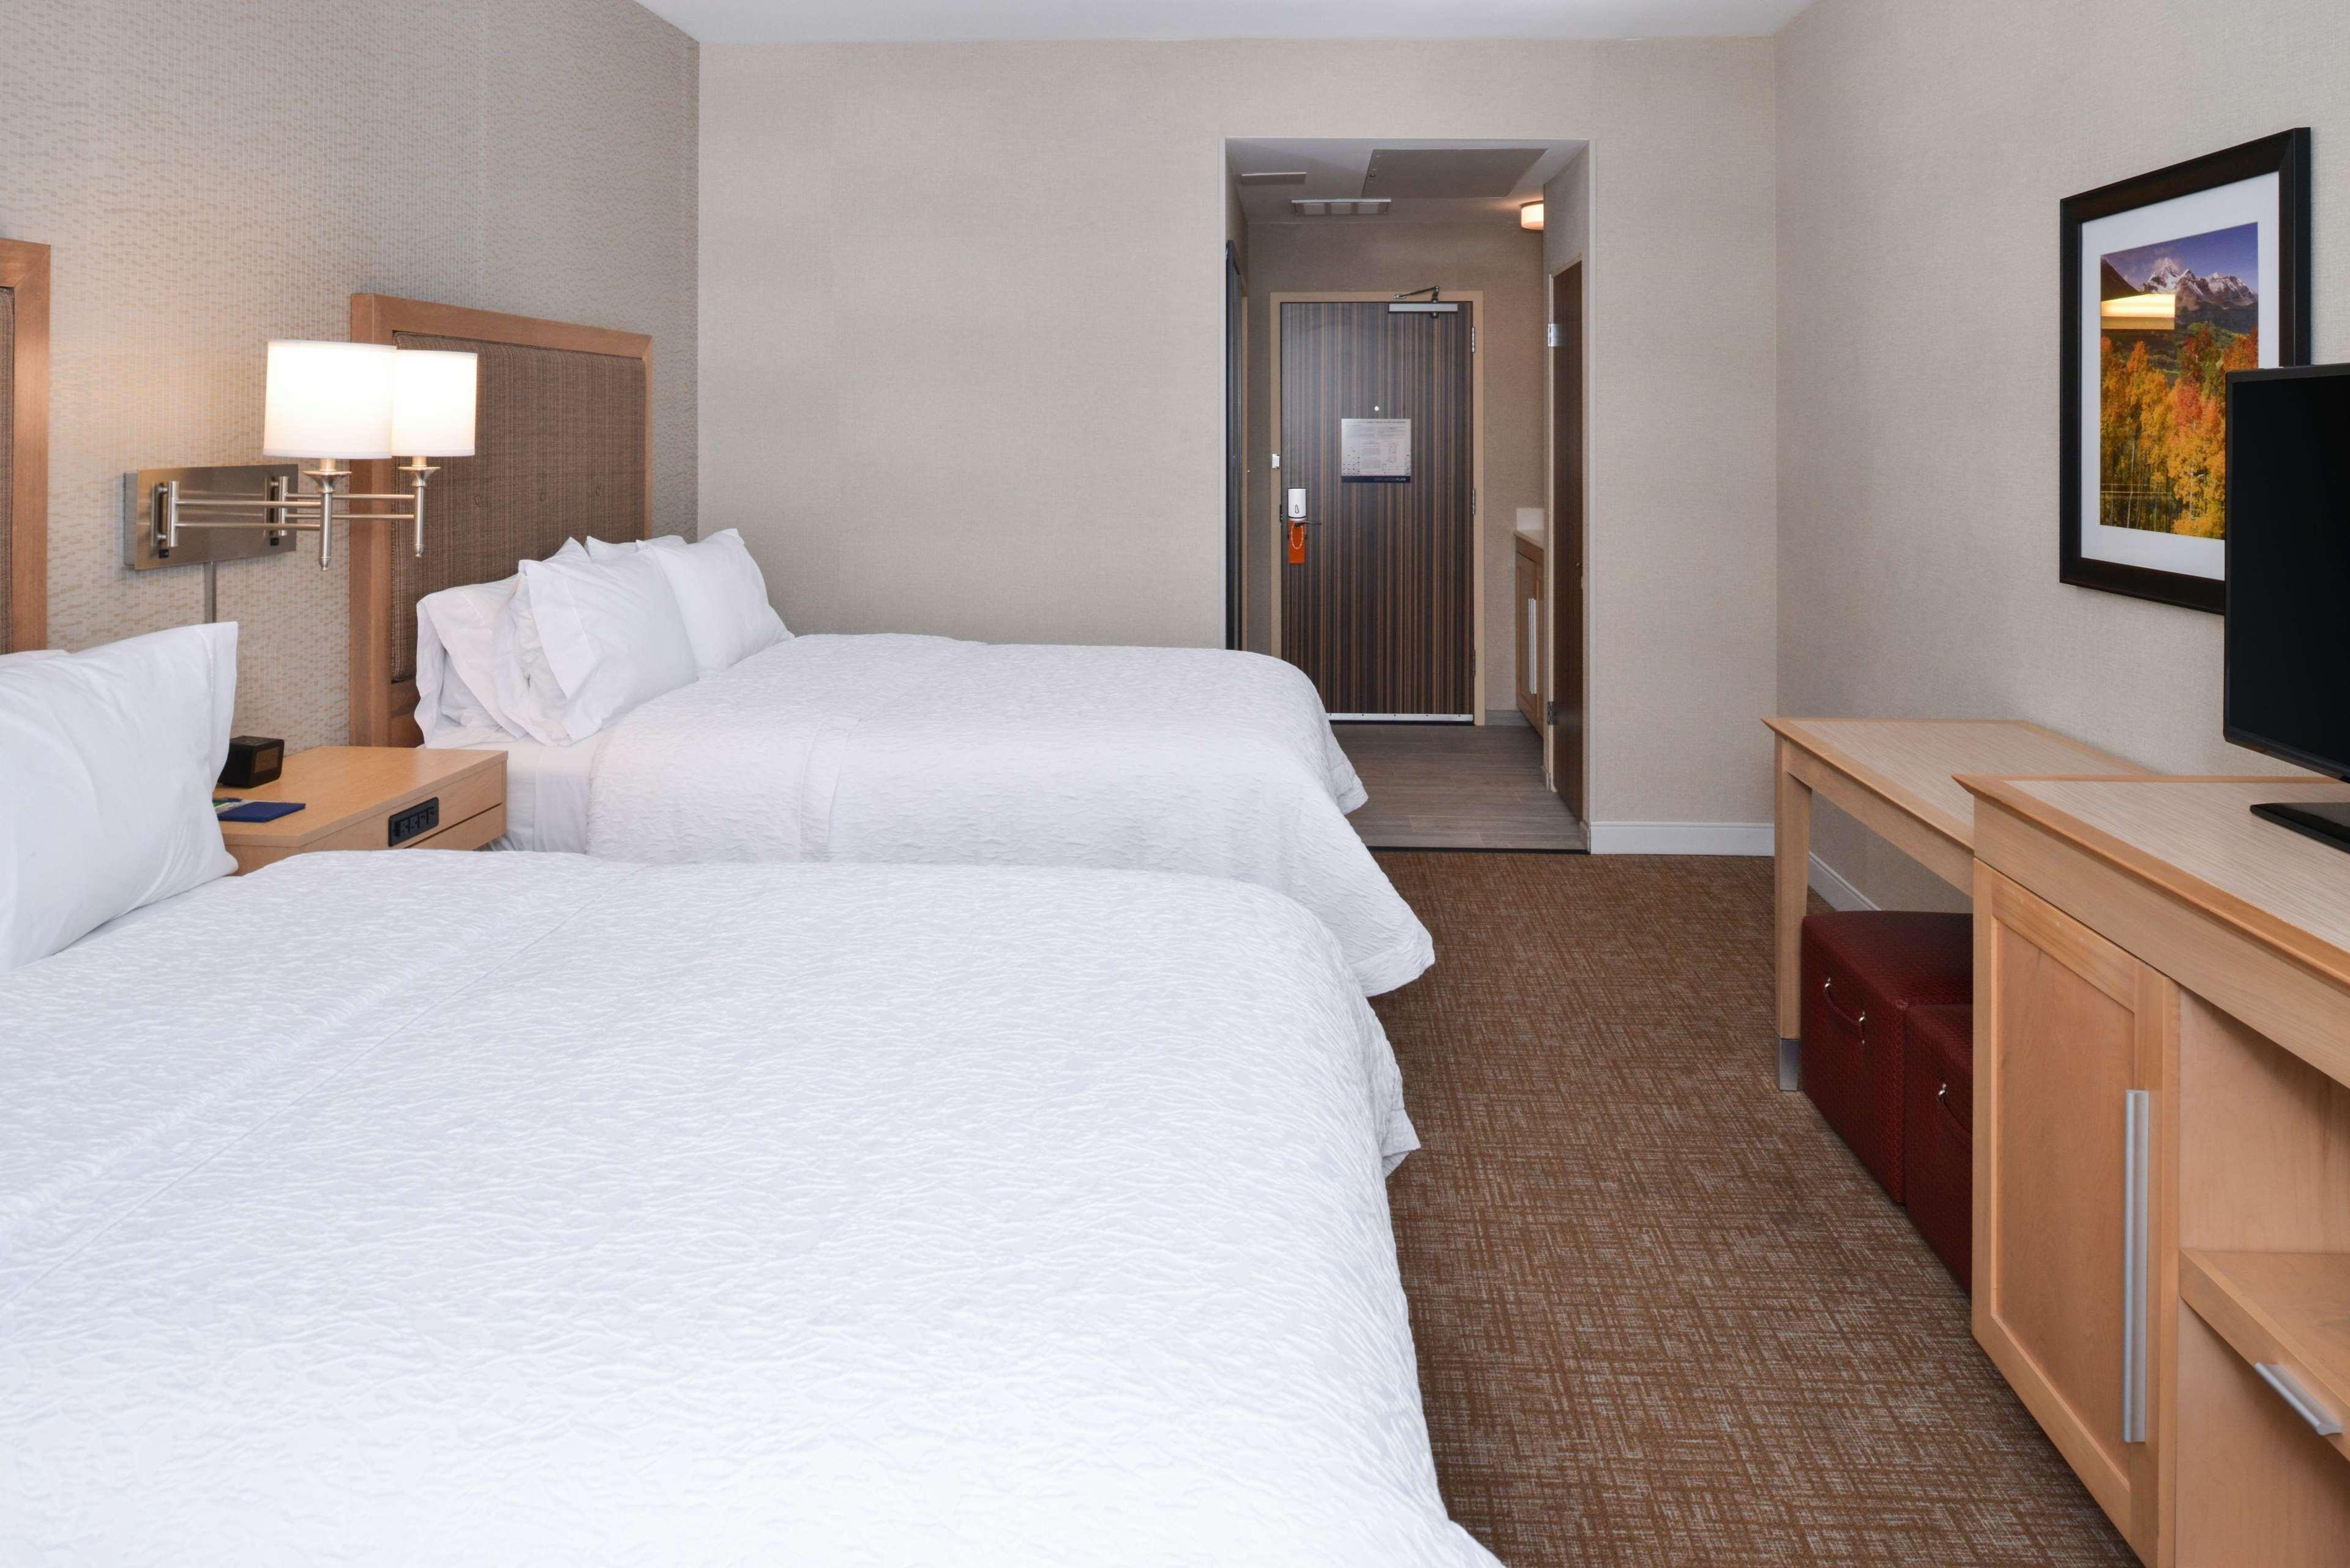 Hampton Inn & Suites Denver-Speer Boulevard image 40